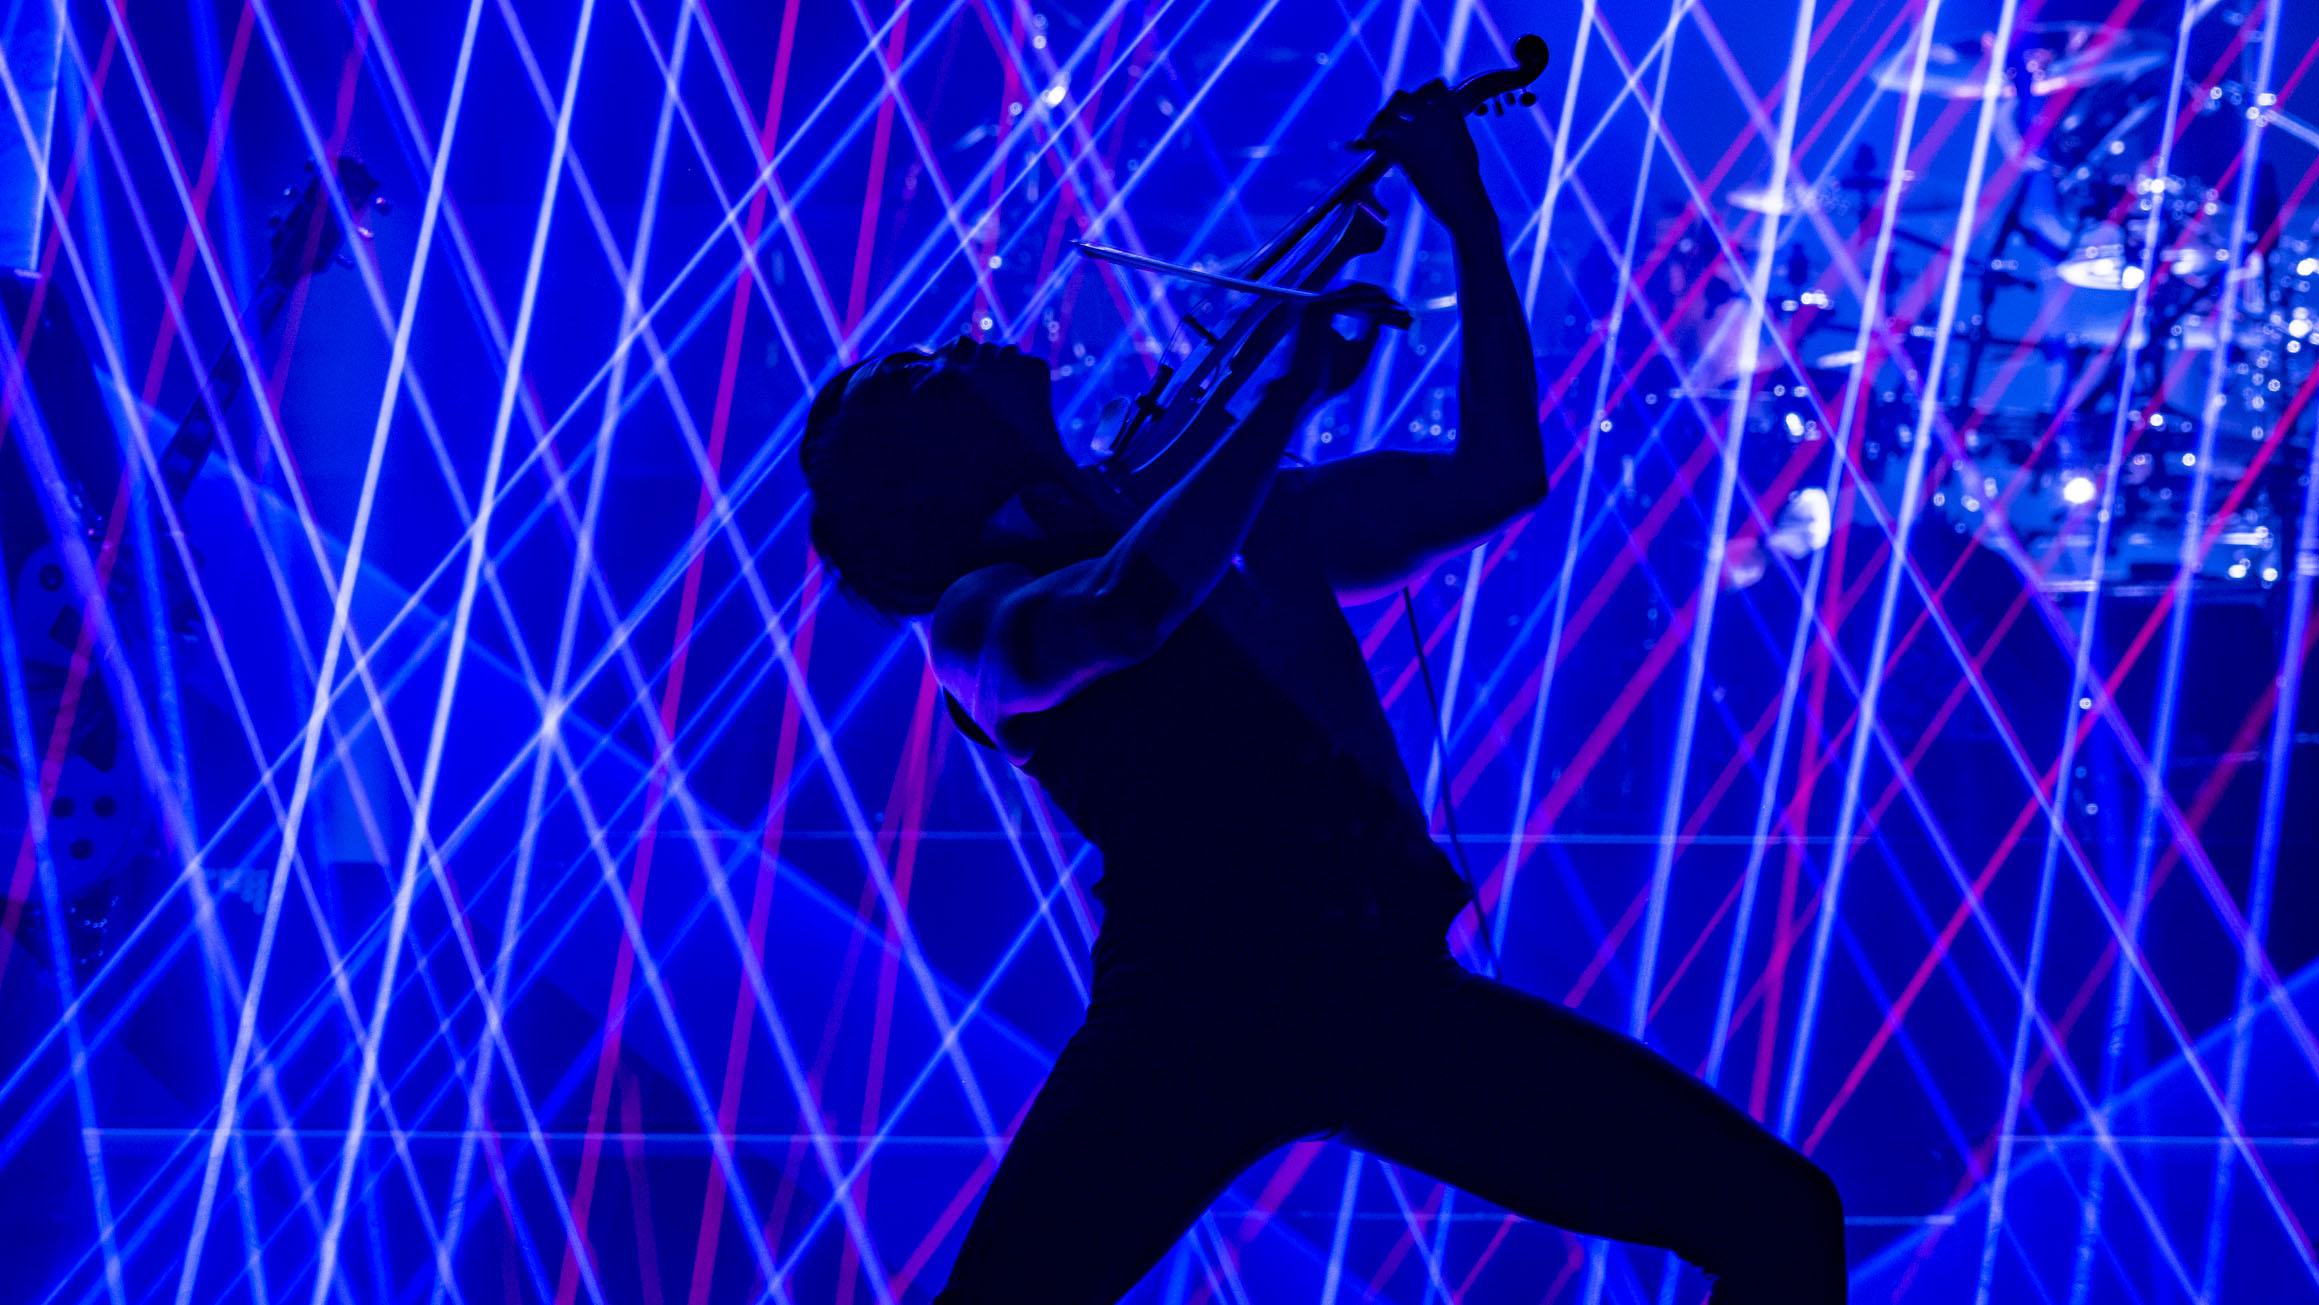 New concerts: Jill Scott, Michael Bolton, Ricky Skaggs, more